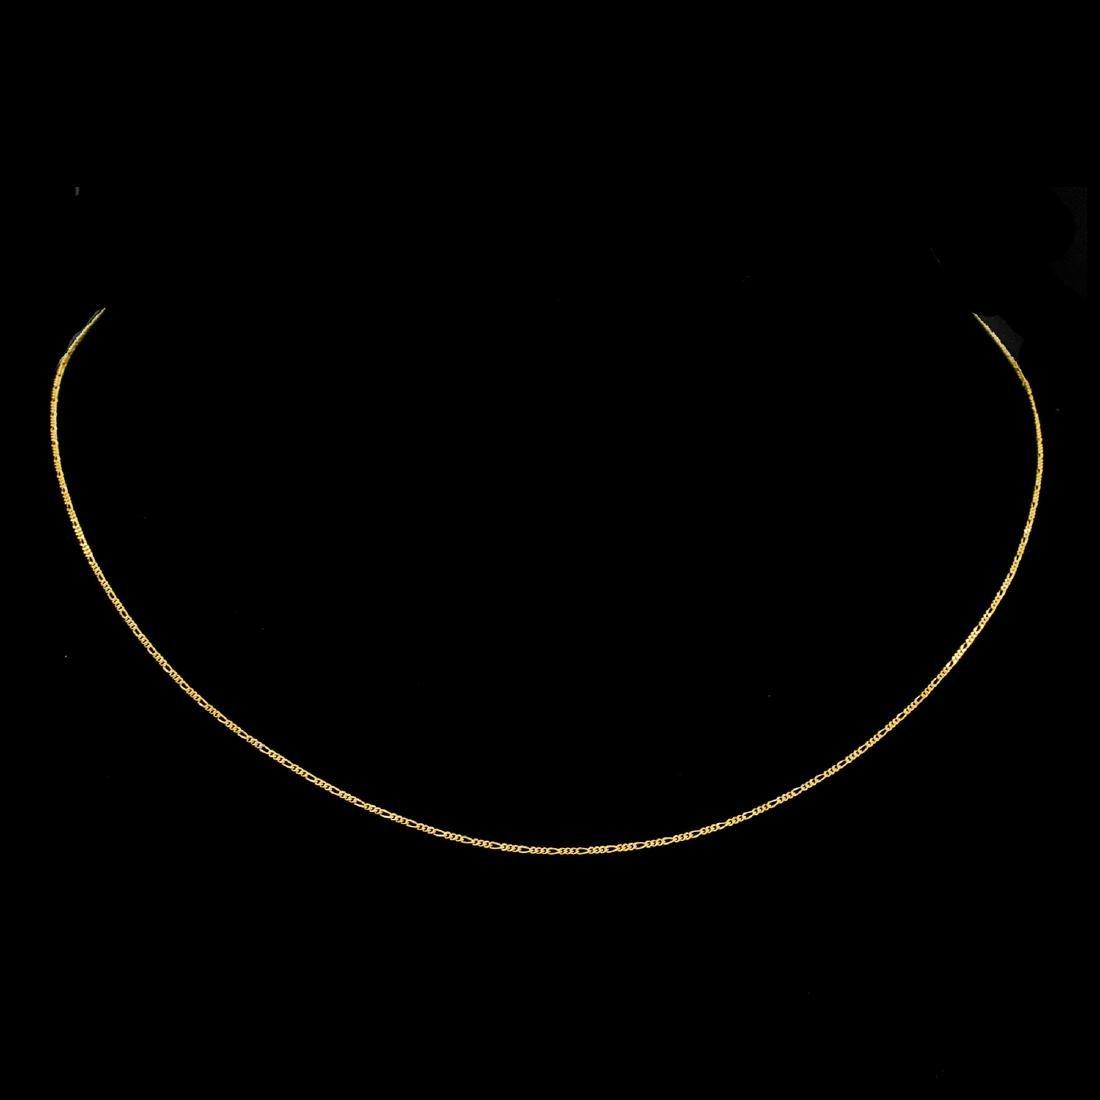 *Fine Jewelry 14KT Gold, 1.2GM. 18'' Chain Necklace (GL